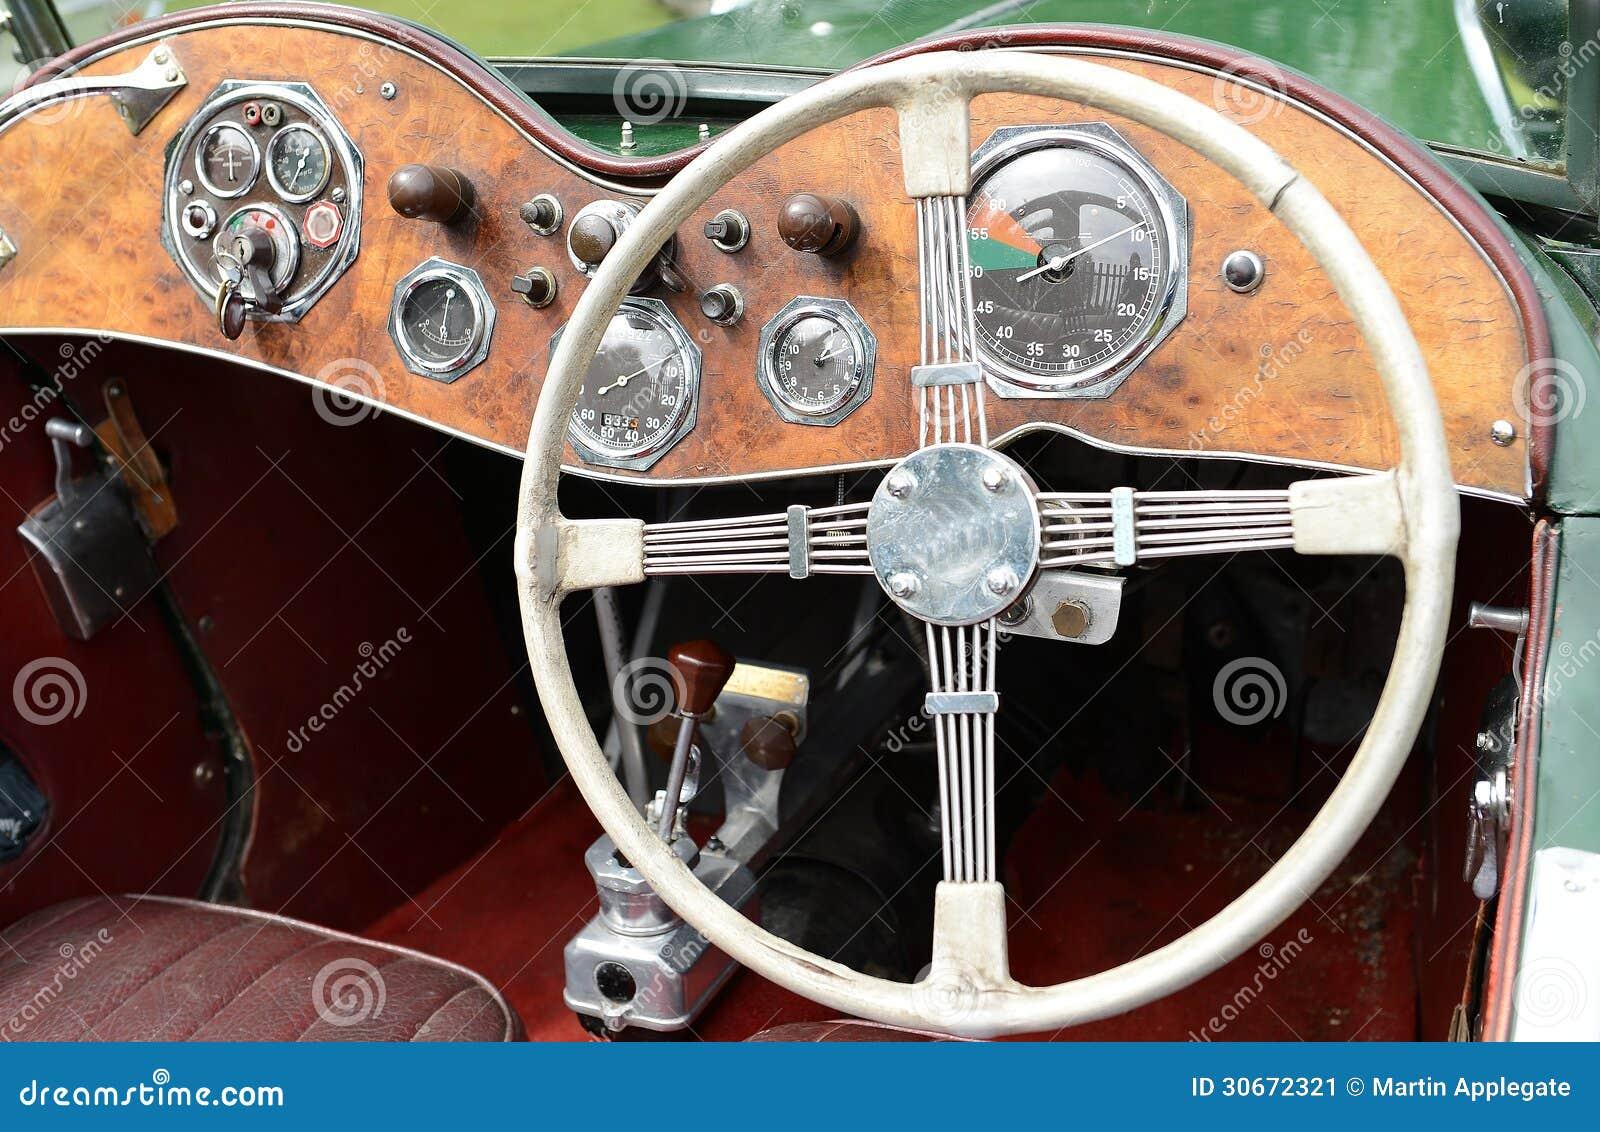 mg classic sports car stock image image 30672321. Black Bedroom Furniture Sets. Home Design Ideas